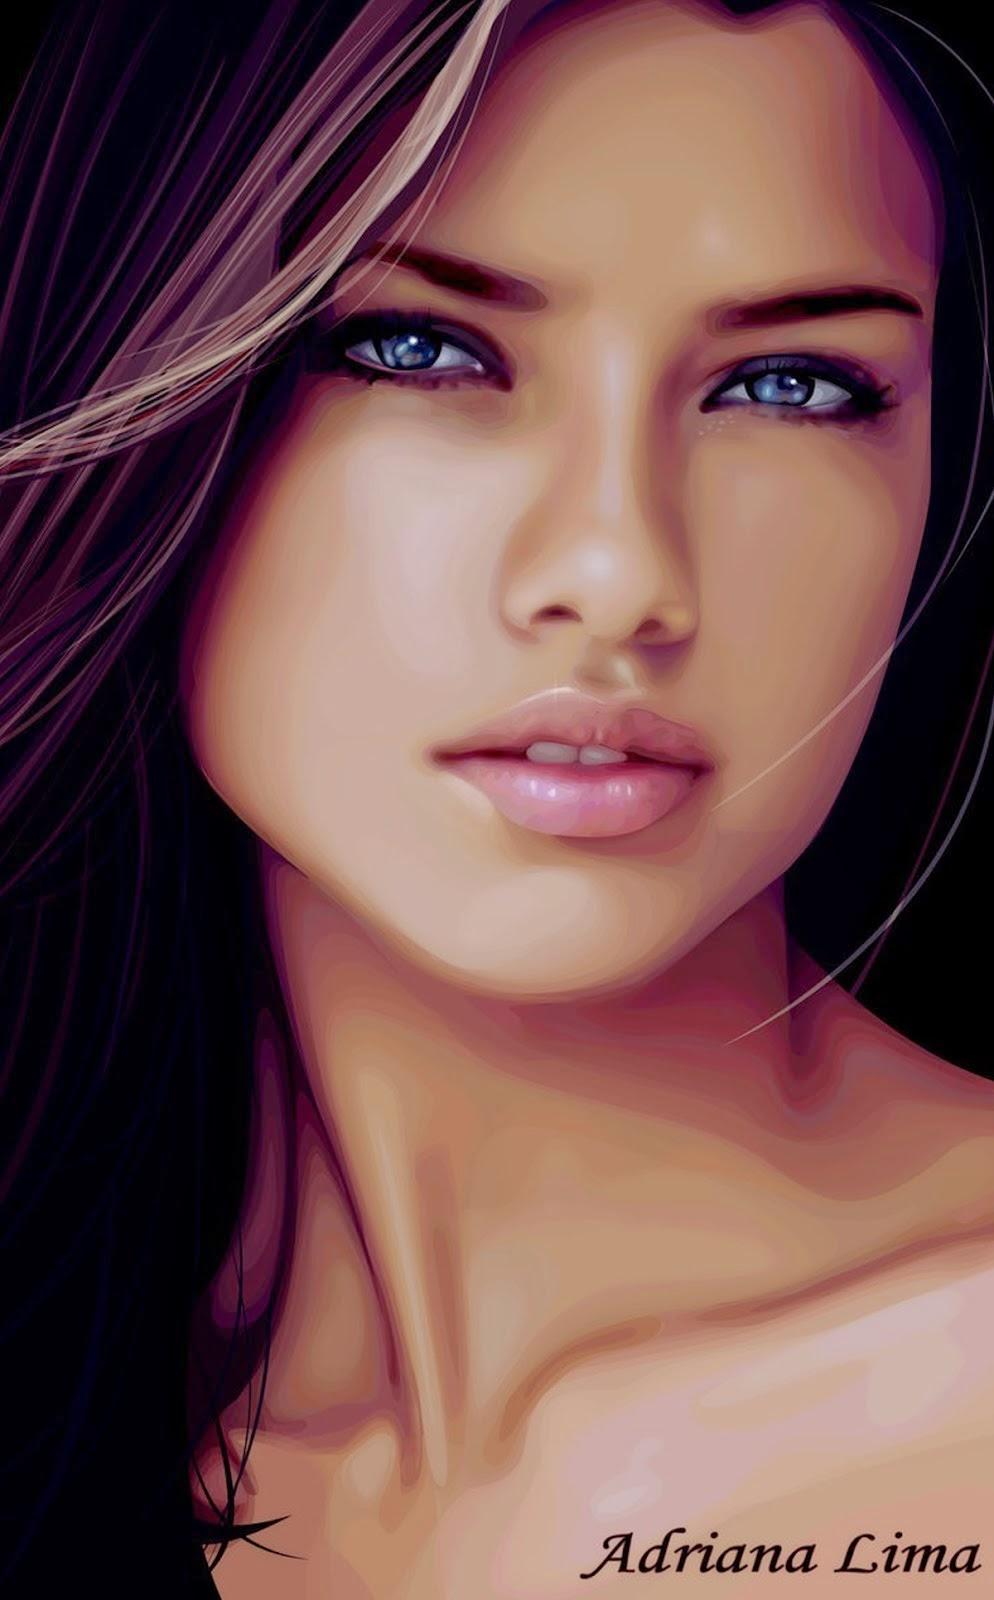 Adriana Lima Age >> Billboard USA | Music News: ADRIANA LIMA PORTRAIT CLOSE UP